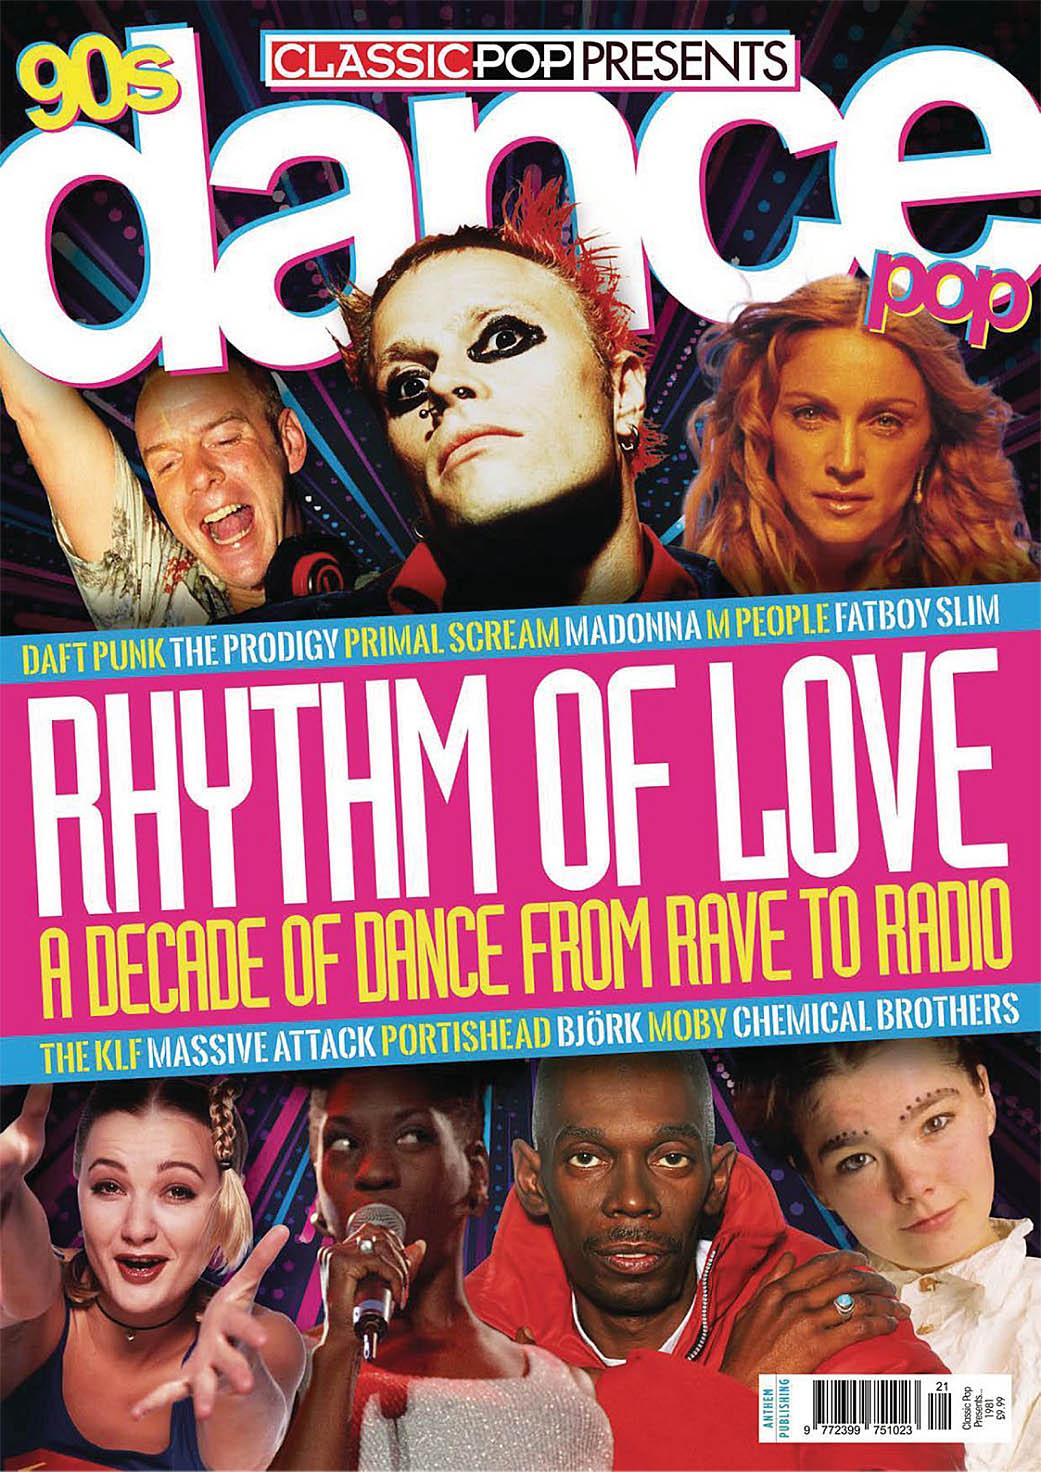 Classic Pop Presents - 90s Dance 2021.jpg